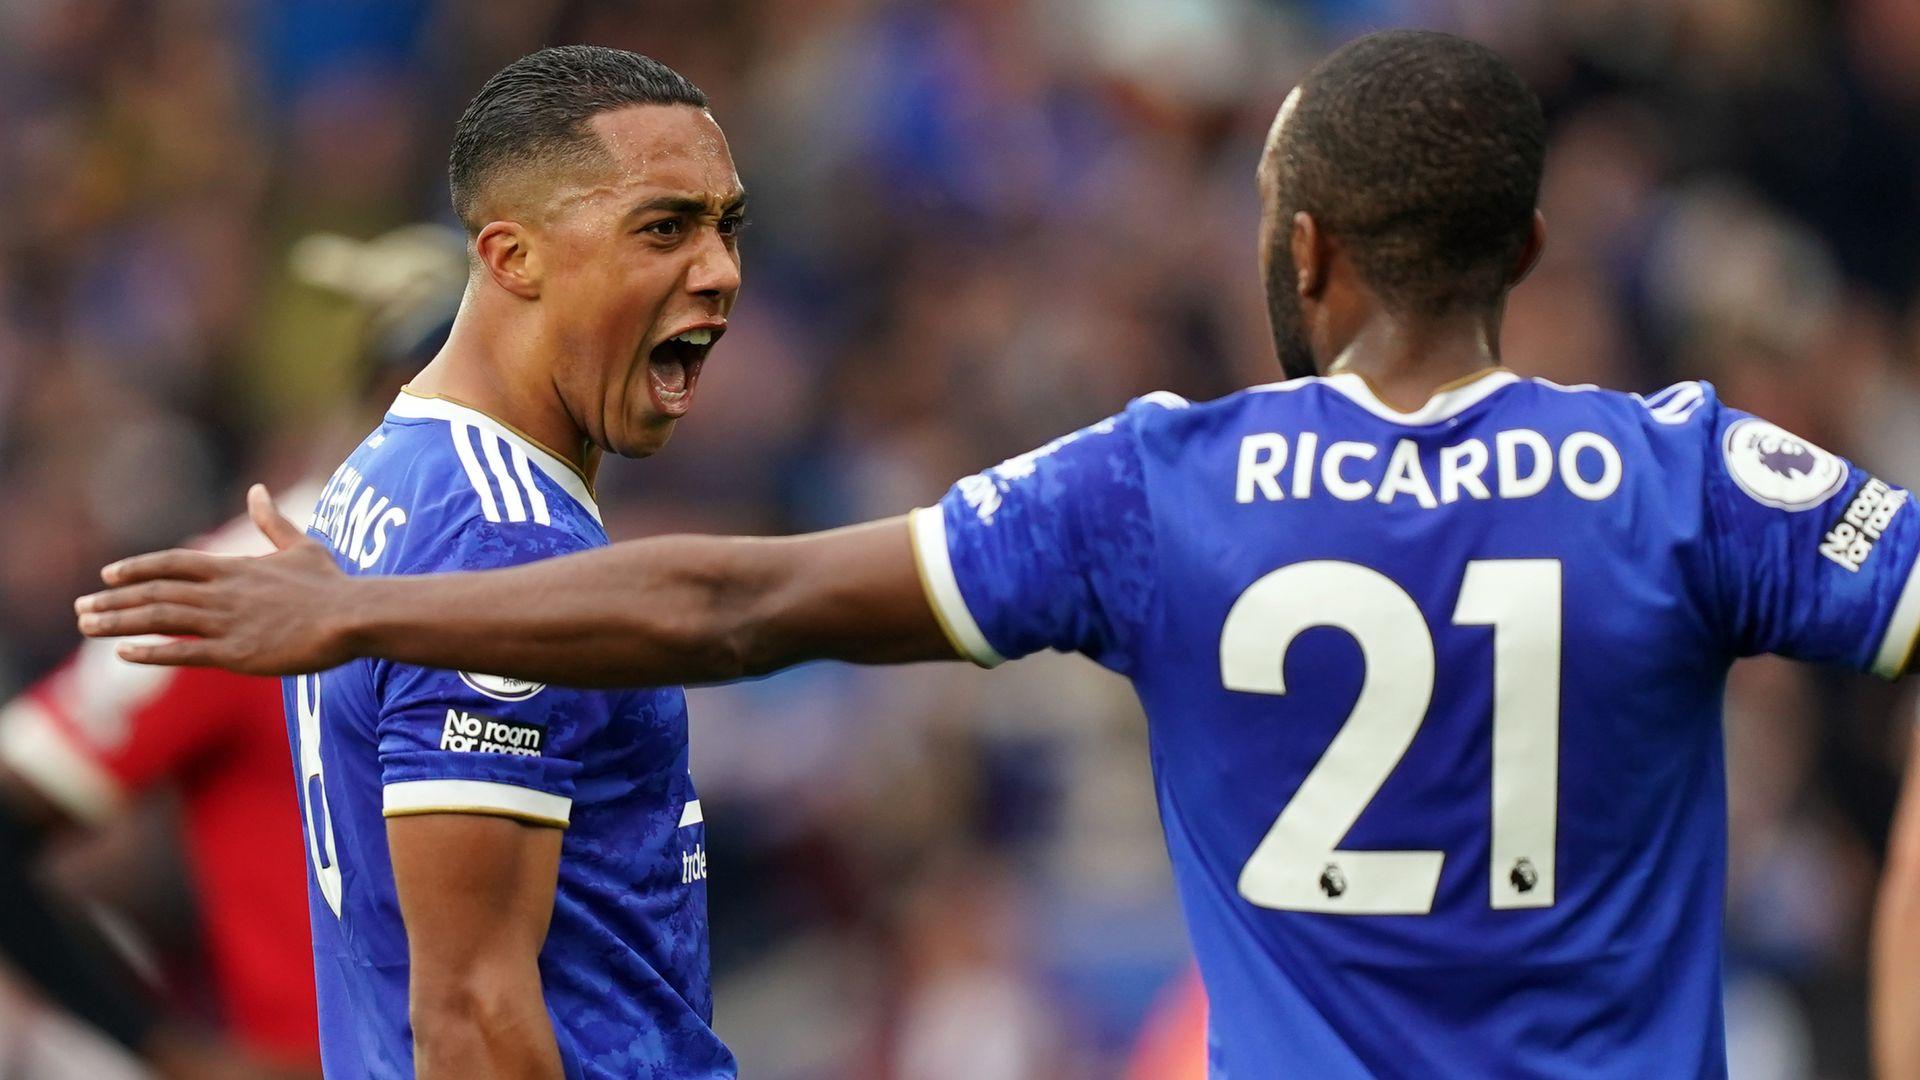 Leicester end Man Utd run in 4-2 thriller - sky sports